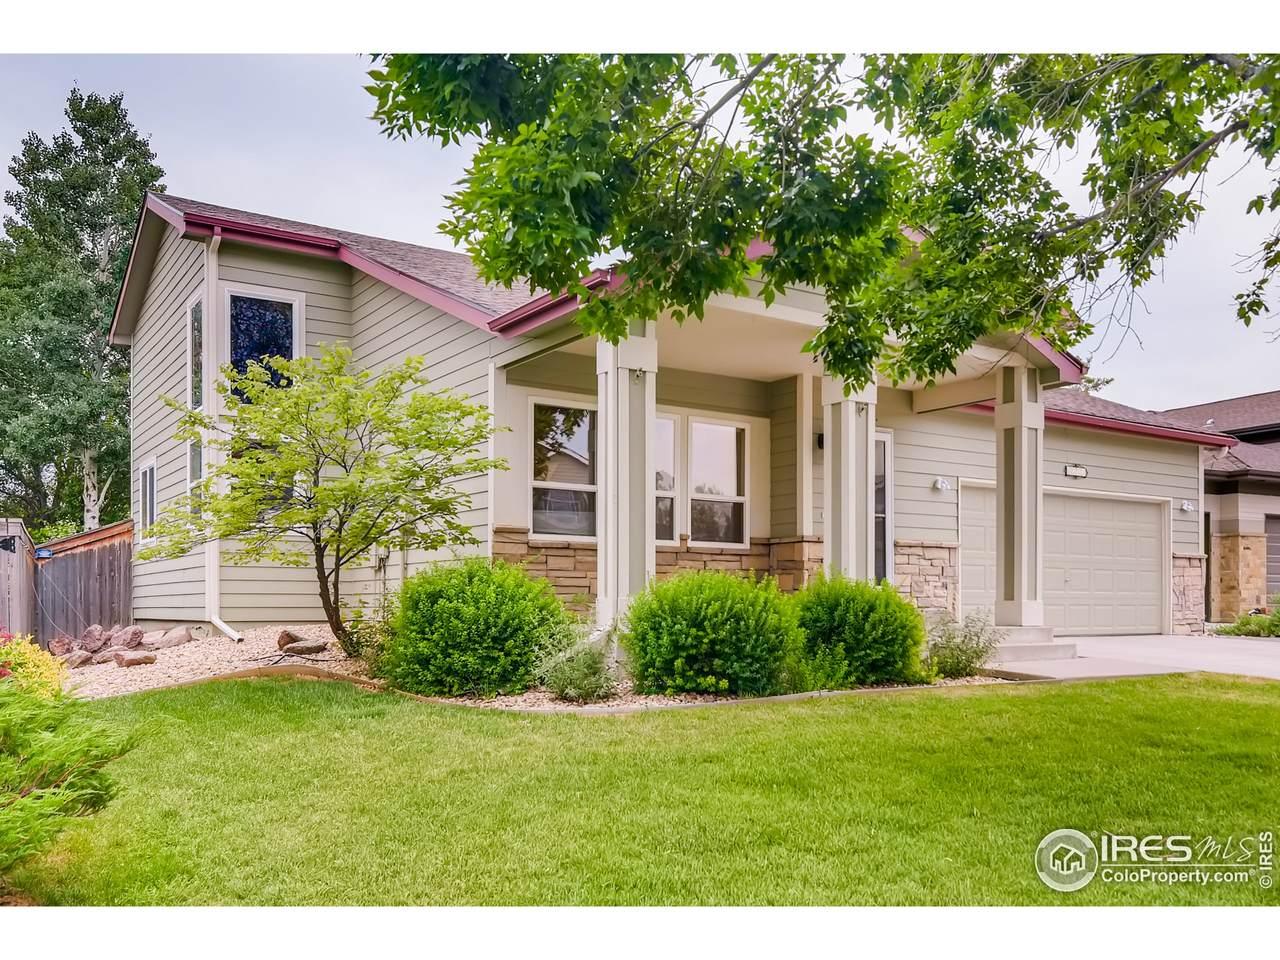 3233 Reedgrass Ct - Photo 1